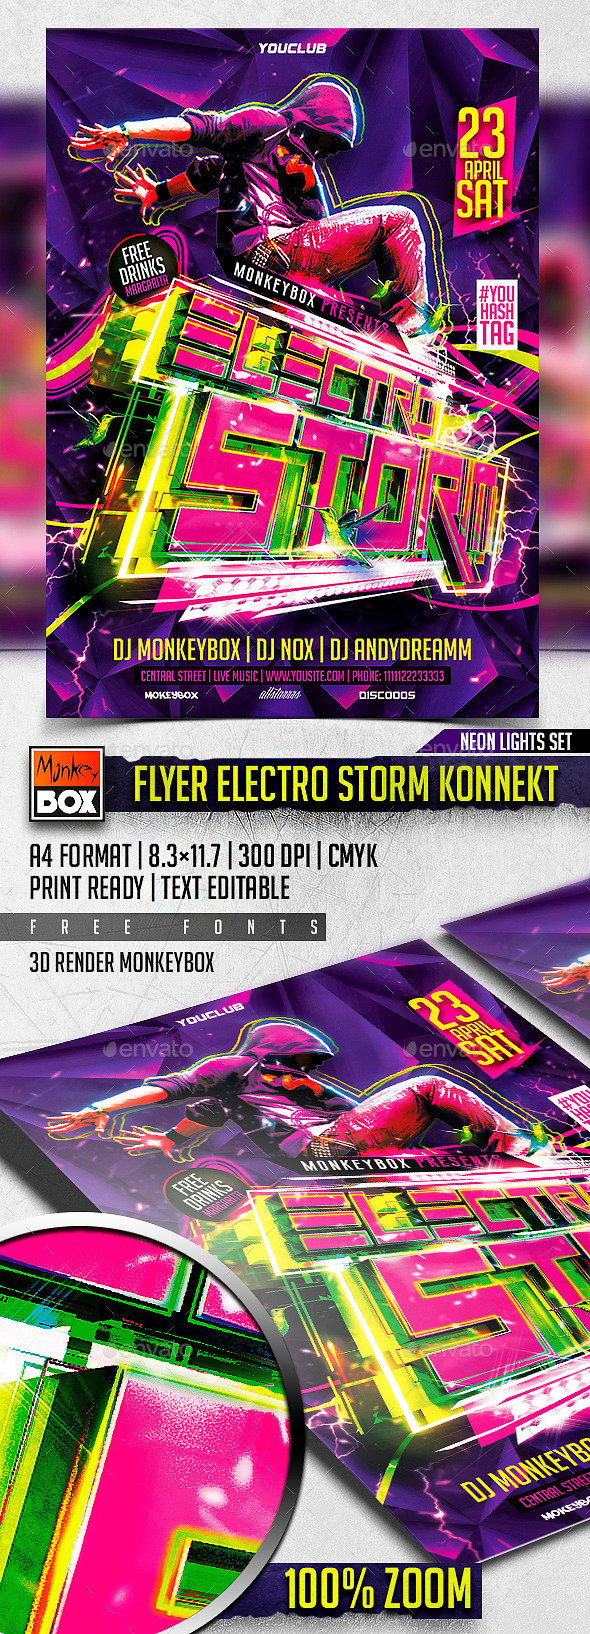 GraphicRiver Flyer Electro Storm Konnekt 11304949